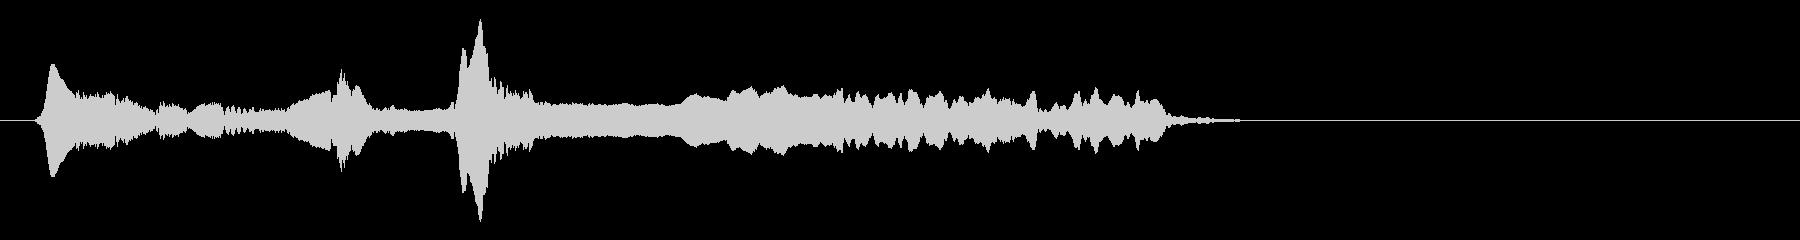 尺八 生演奏 古典風#20の未再生の波形